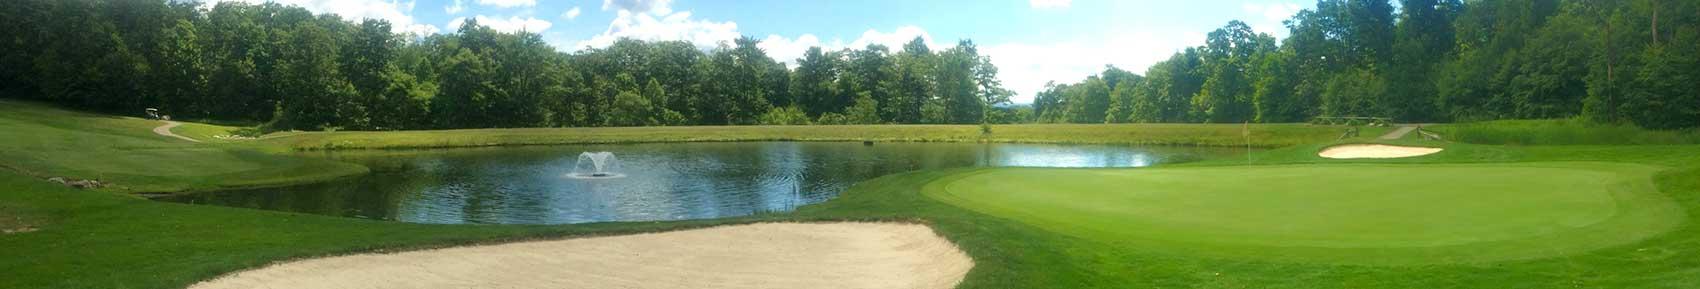 golf-fairway-scenic-3